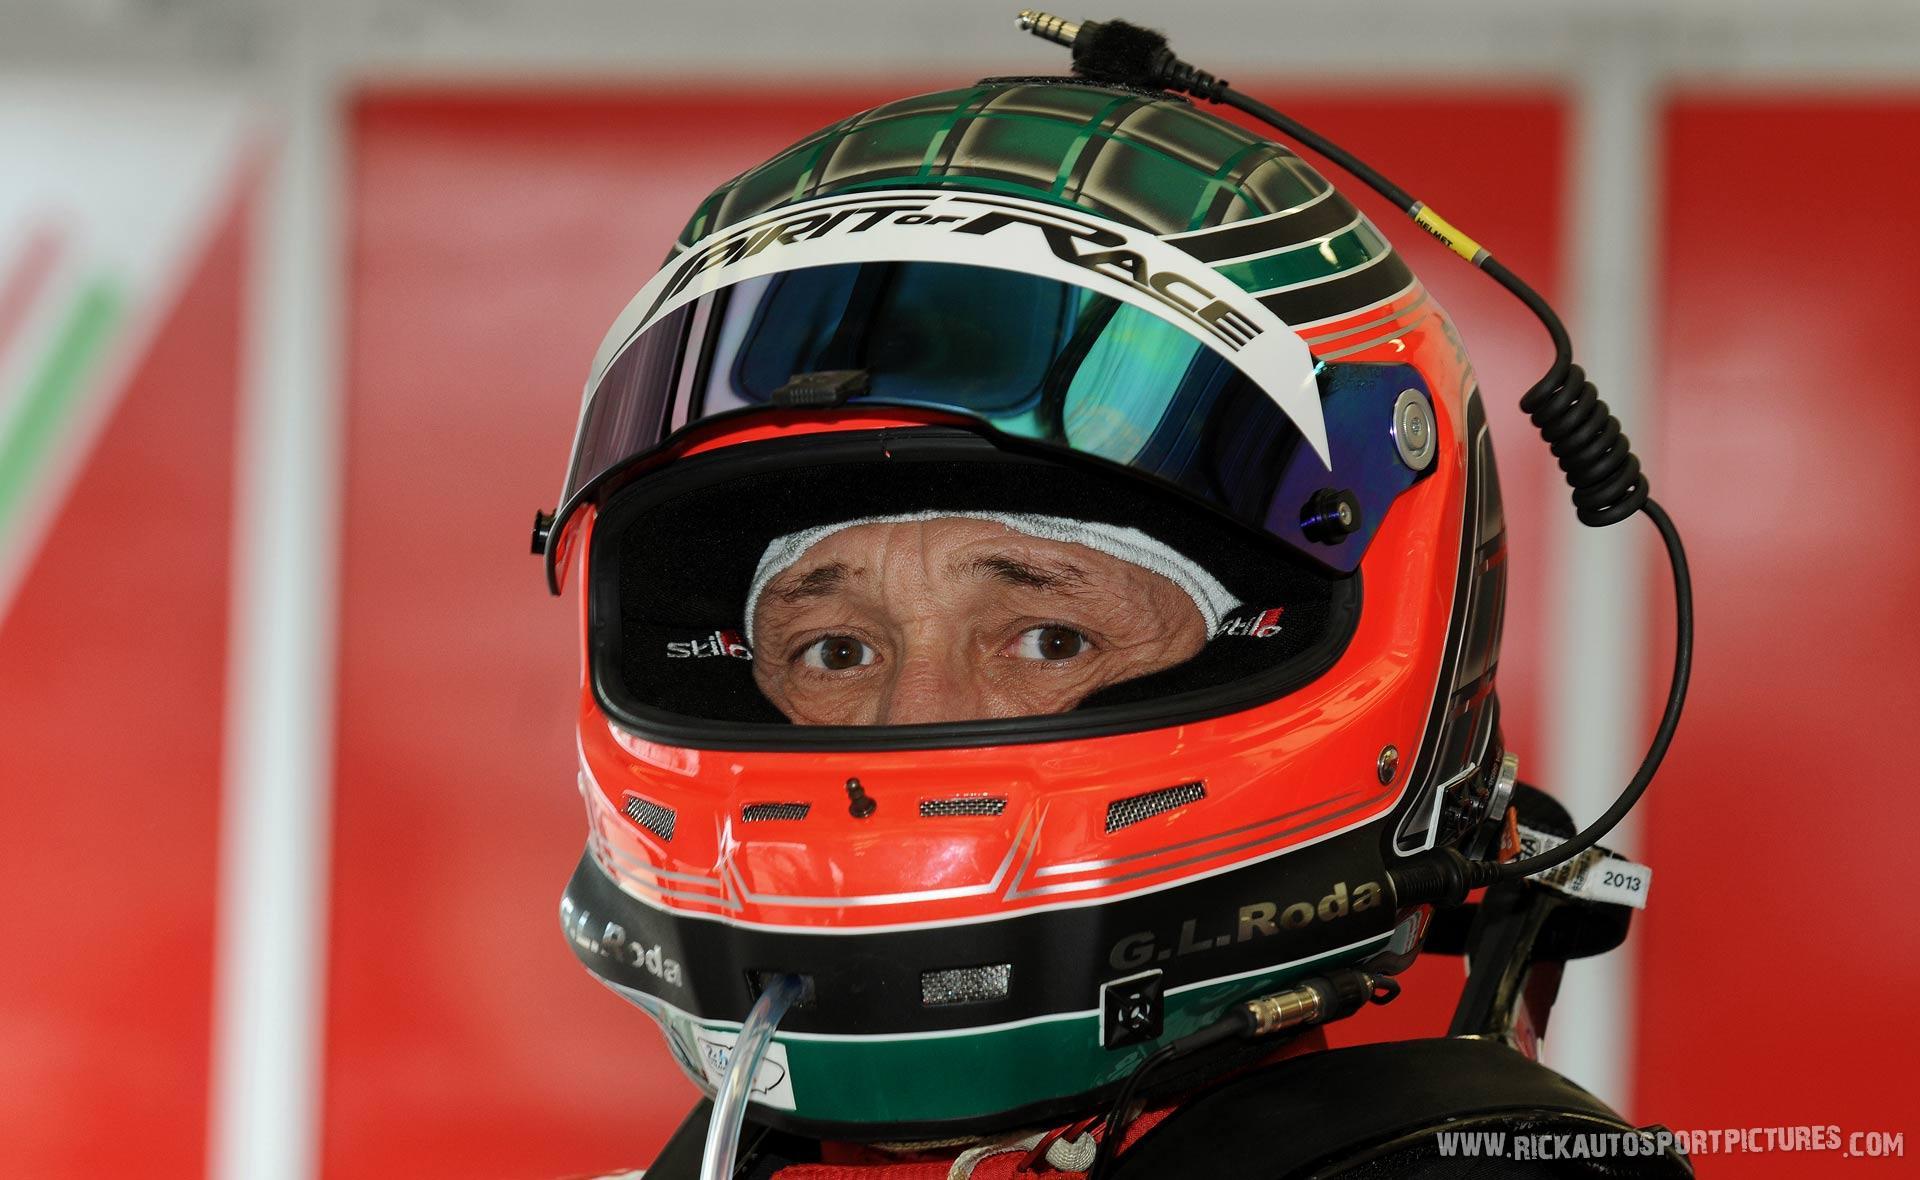 Gianluca Roda Silverstone 2017